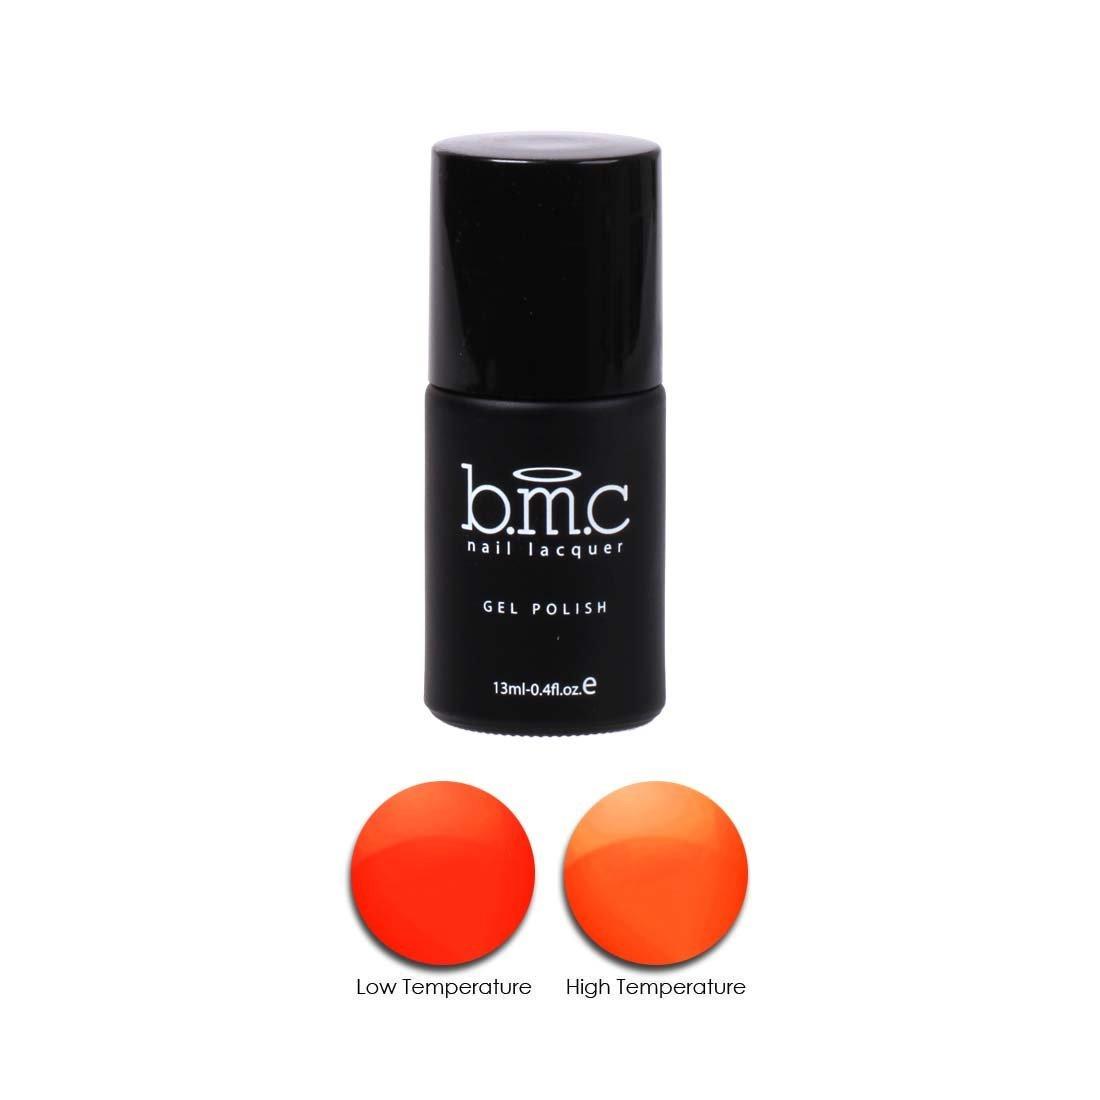 BMC Thermal Effect Color Changing Bright to Pastel Orange Nail Lacquer Gel Polish - Awakening Collection, Sorbet Surge